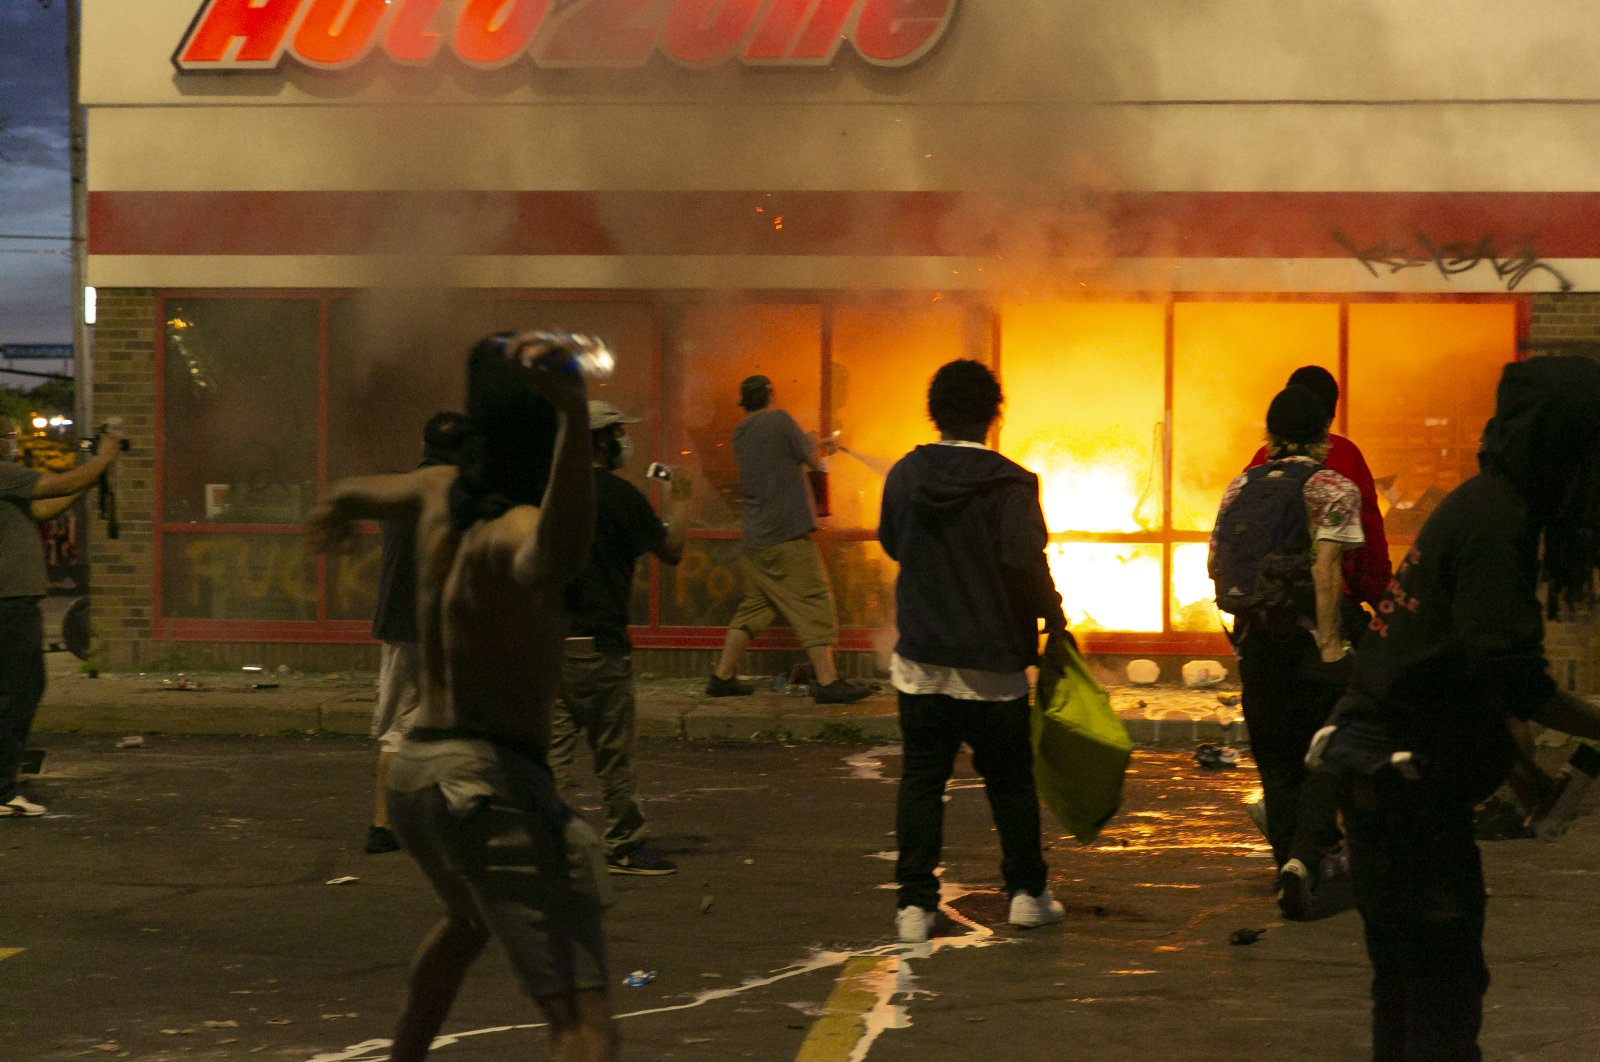 Demonstrators loot stores and set fires, Minneapolis, Minnesota, U.S., May 28, 2020. (AA Photo)